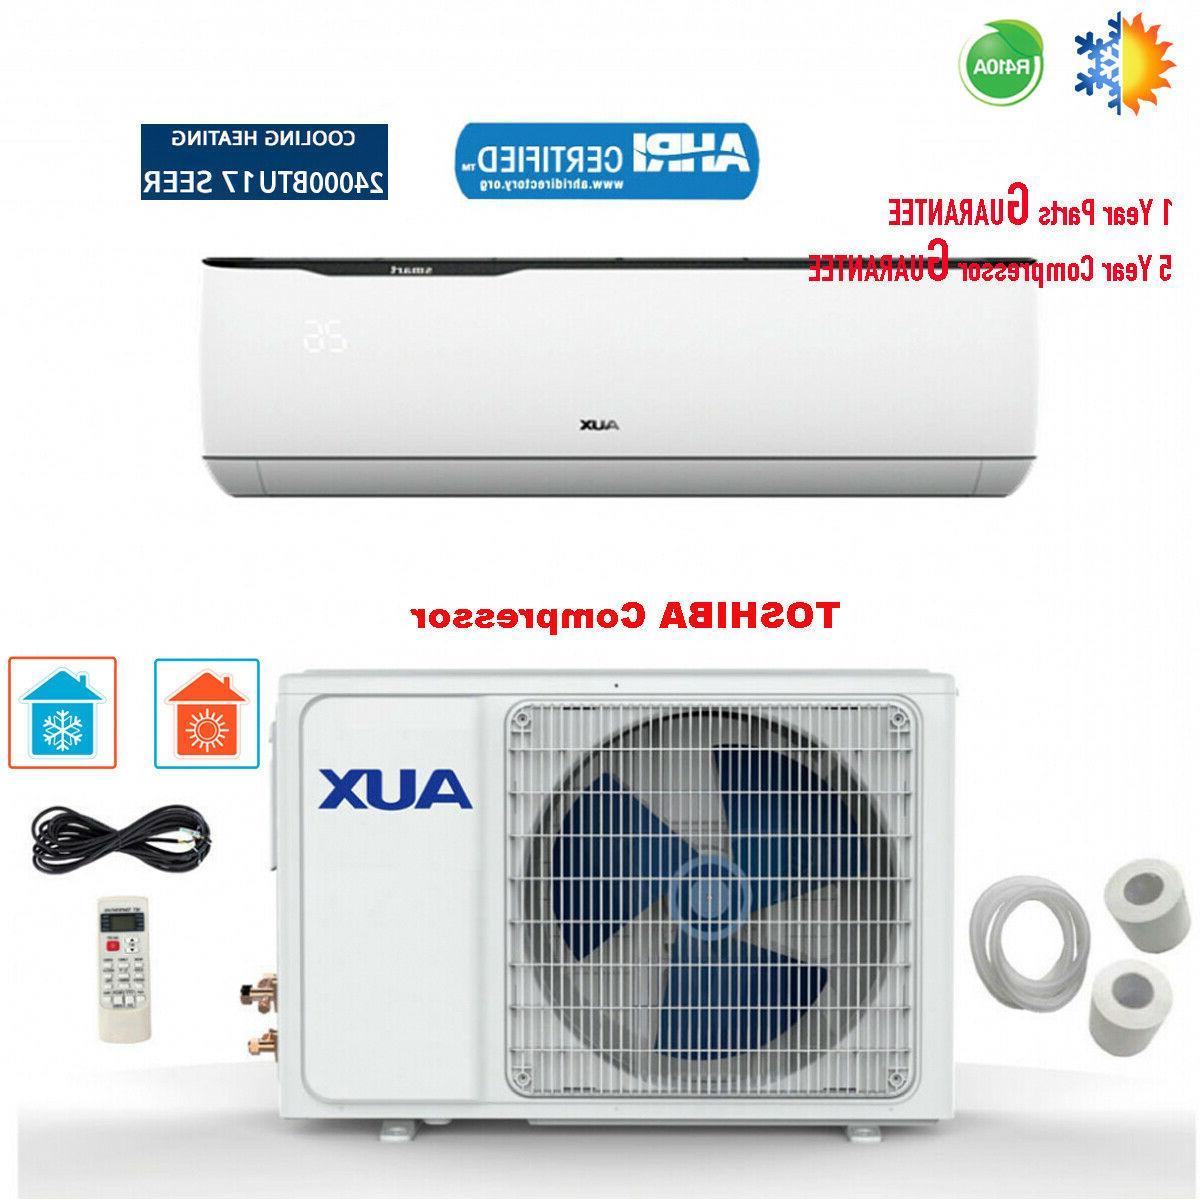 24000btu ductless air conditioner heat pump mini